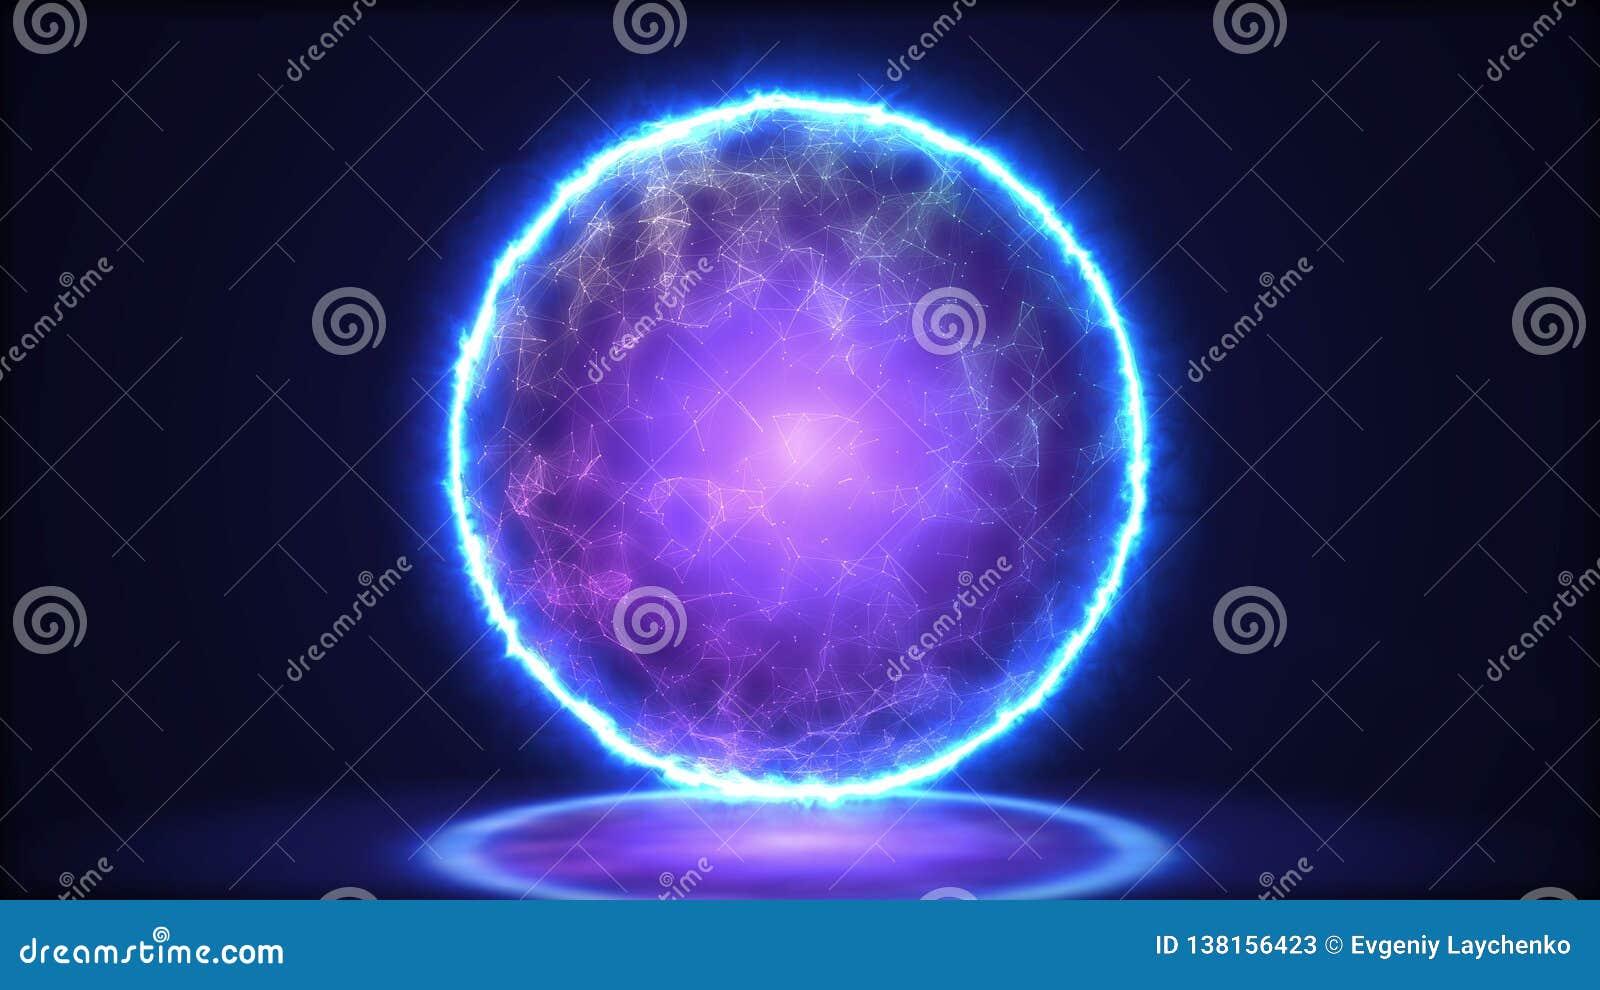 Magic lamp closeup. Energy inside the sphere.3D illustration